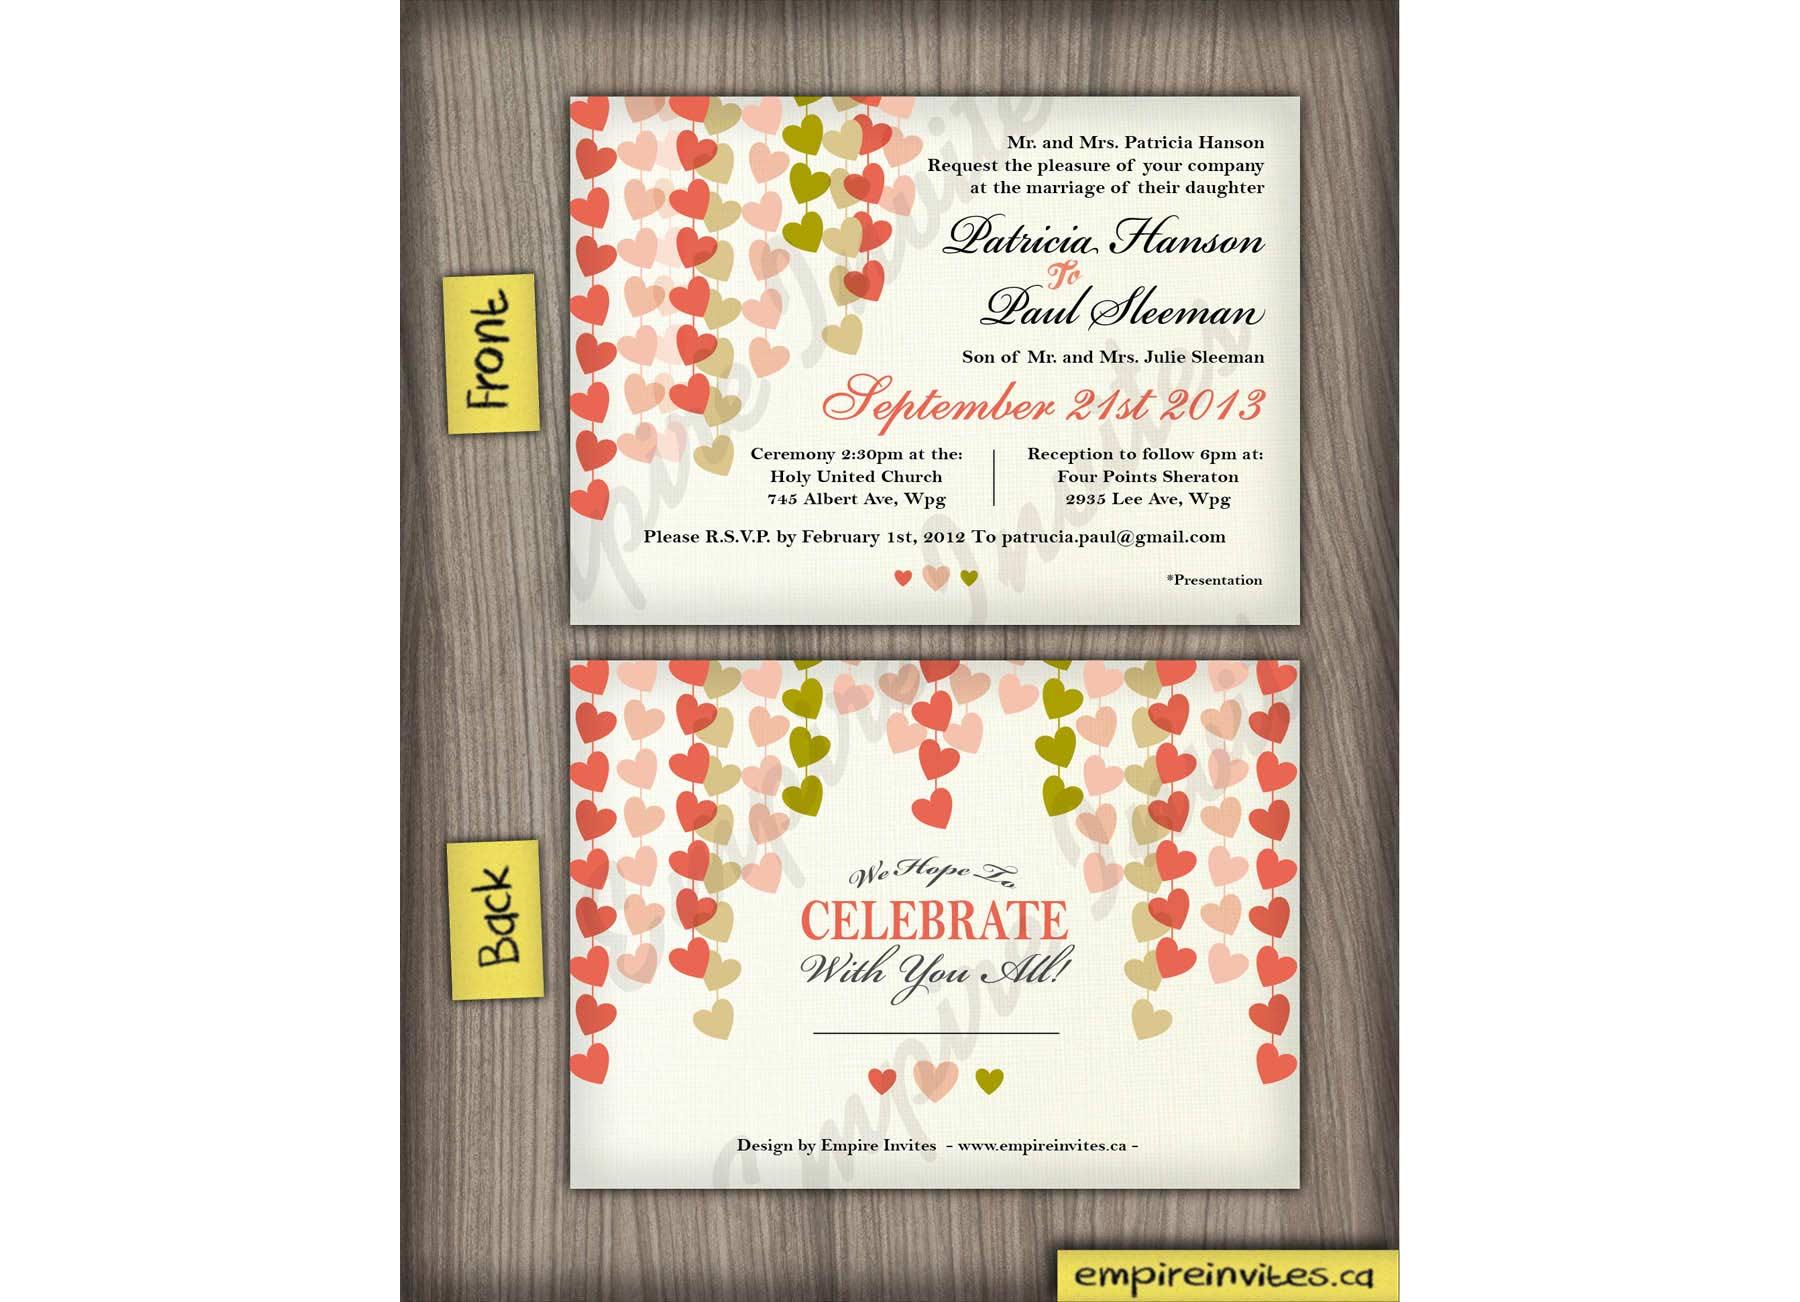 Wedding Invitations In Canada: Custom Heart Wedding Invitations From Winnipeg, Canada